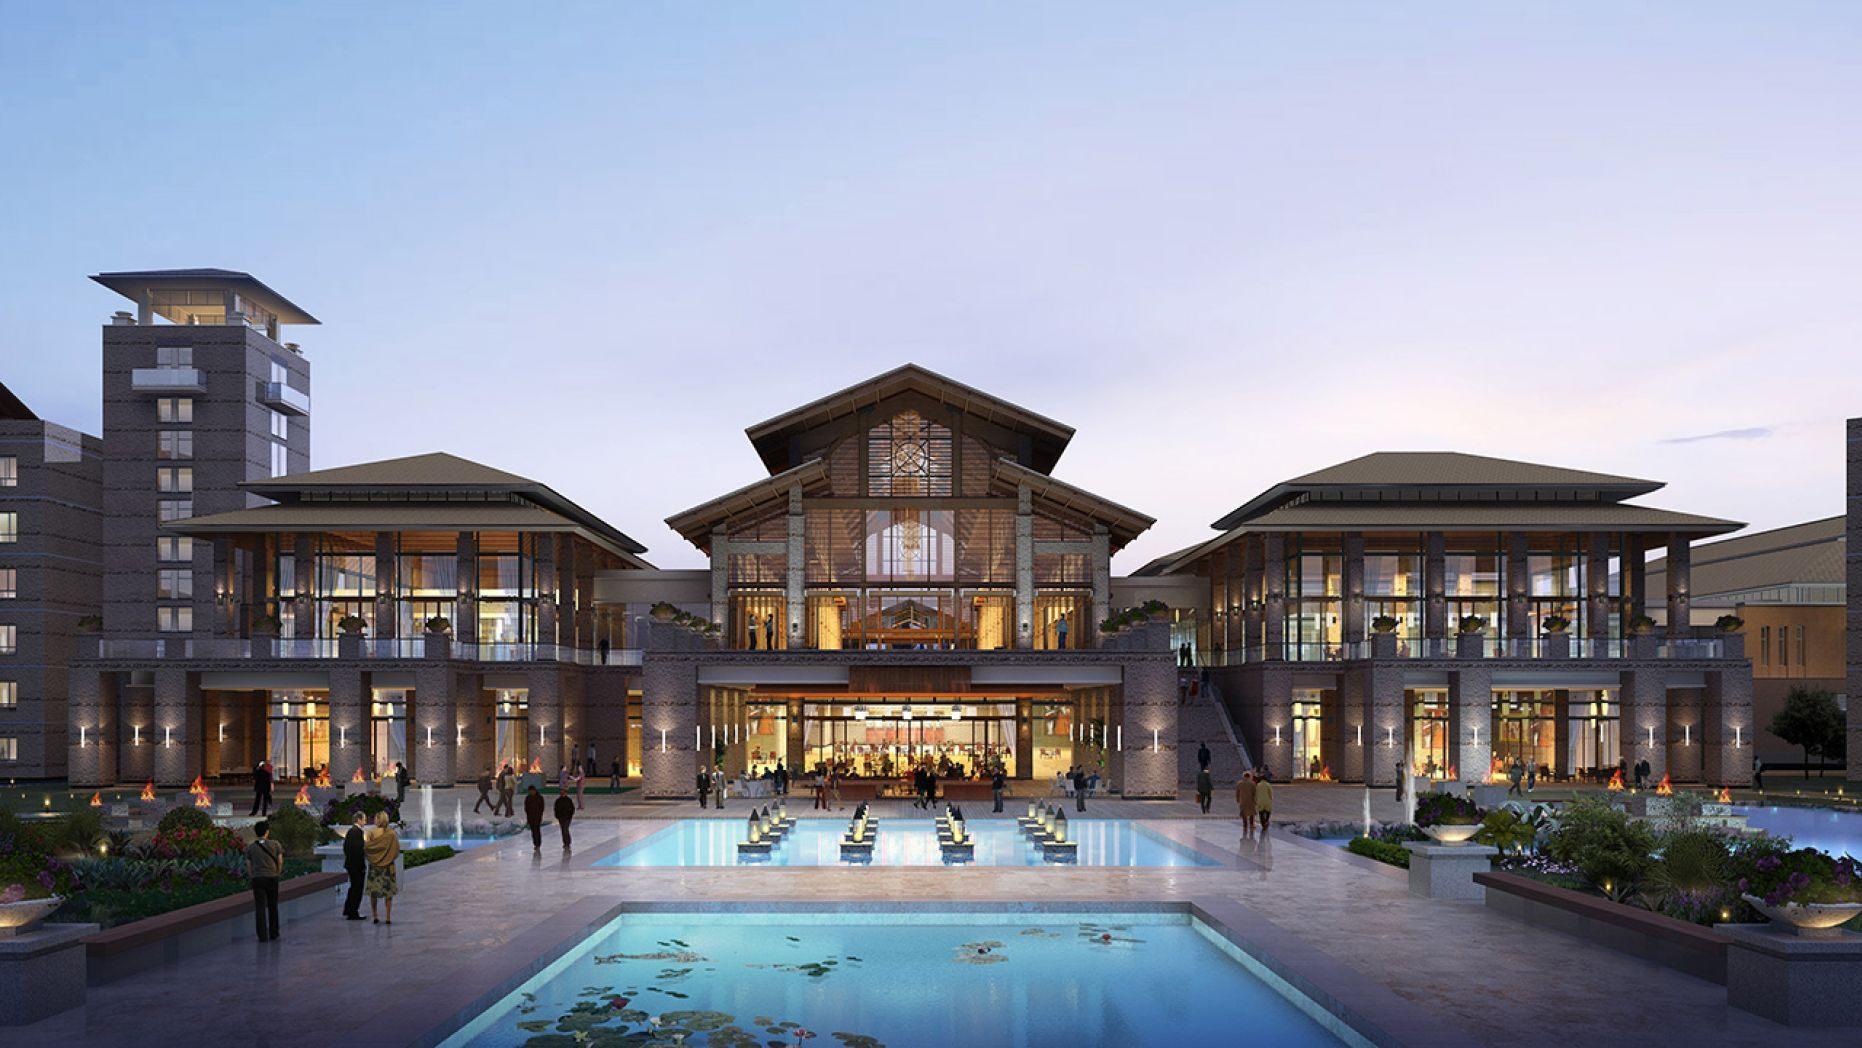 Hilton Closes 150 hotels in China Amid Coronavirus Outbreak